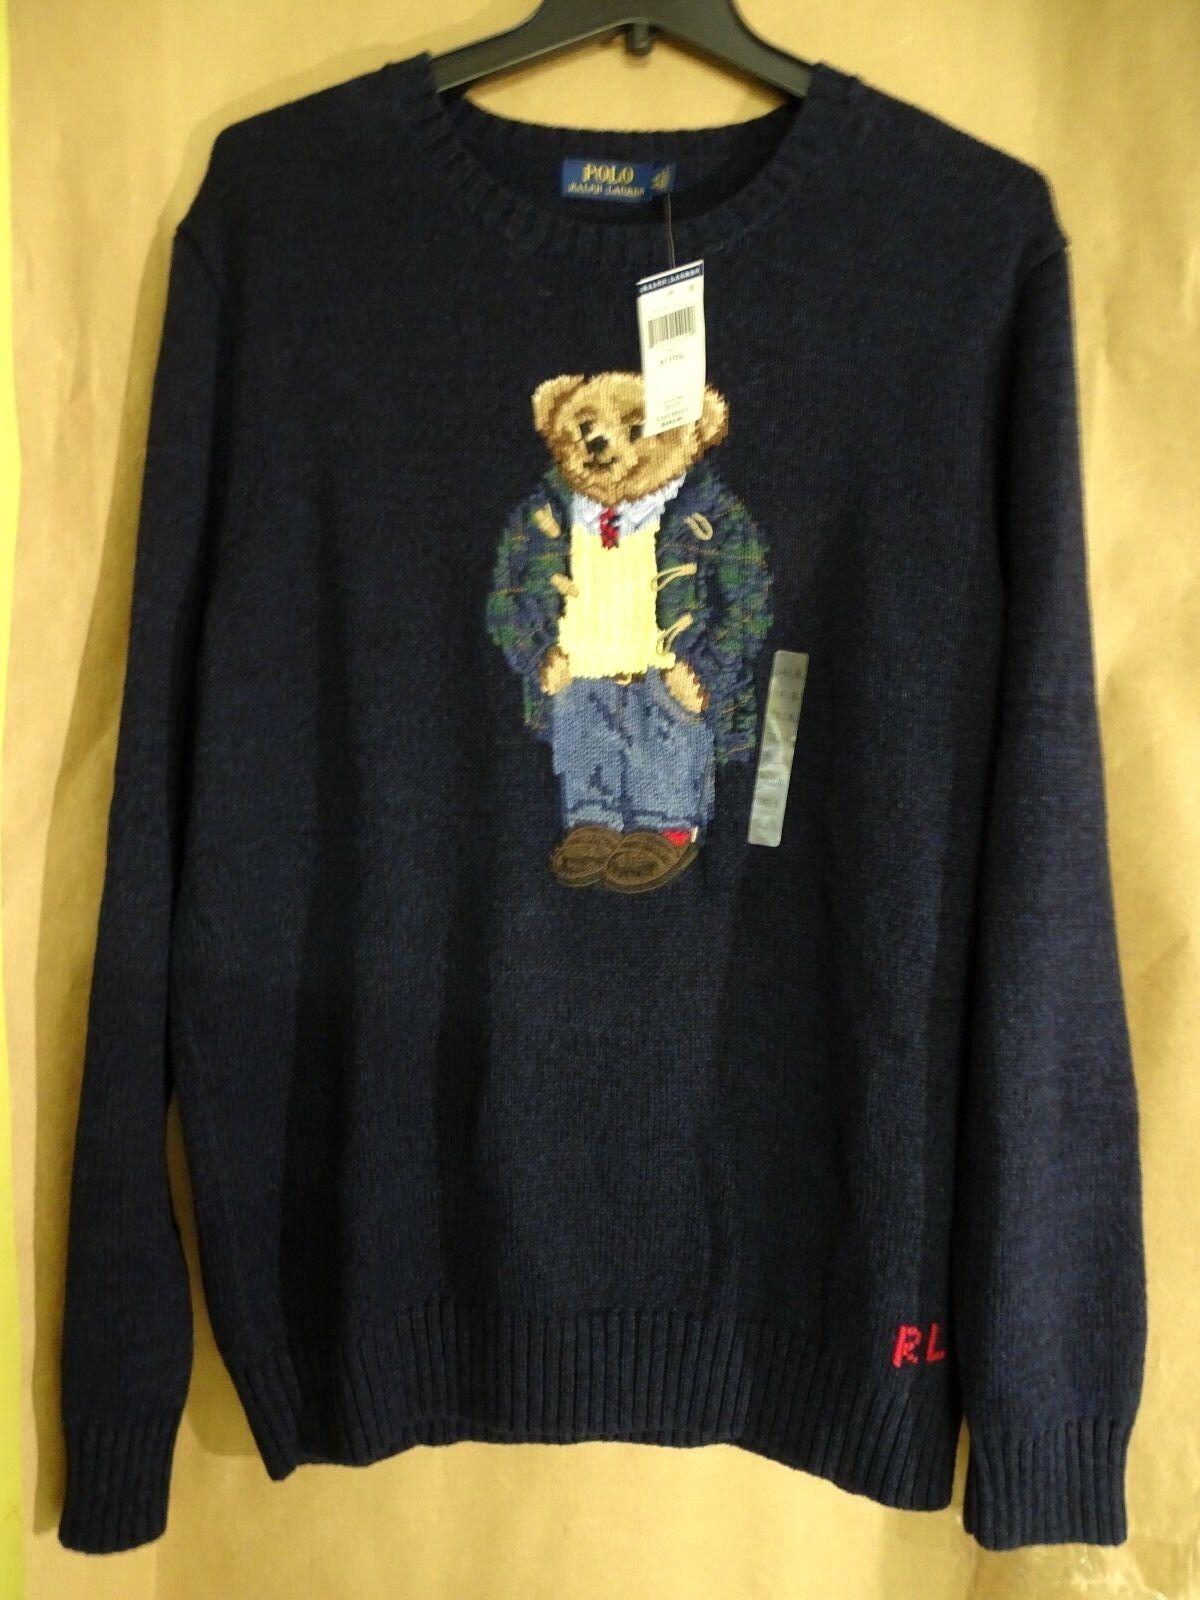 NEW Polo Ralph Lauren Big & Tall Intarsia-Knit Preppy Bear Toggle Mantel Sweater